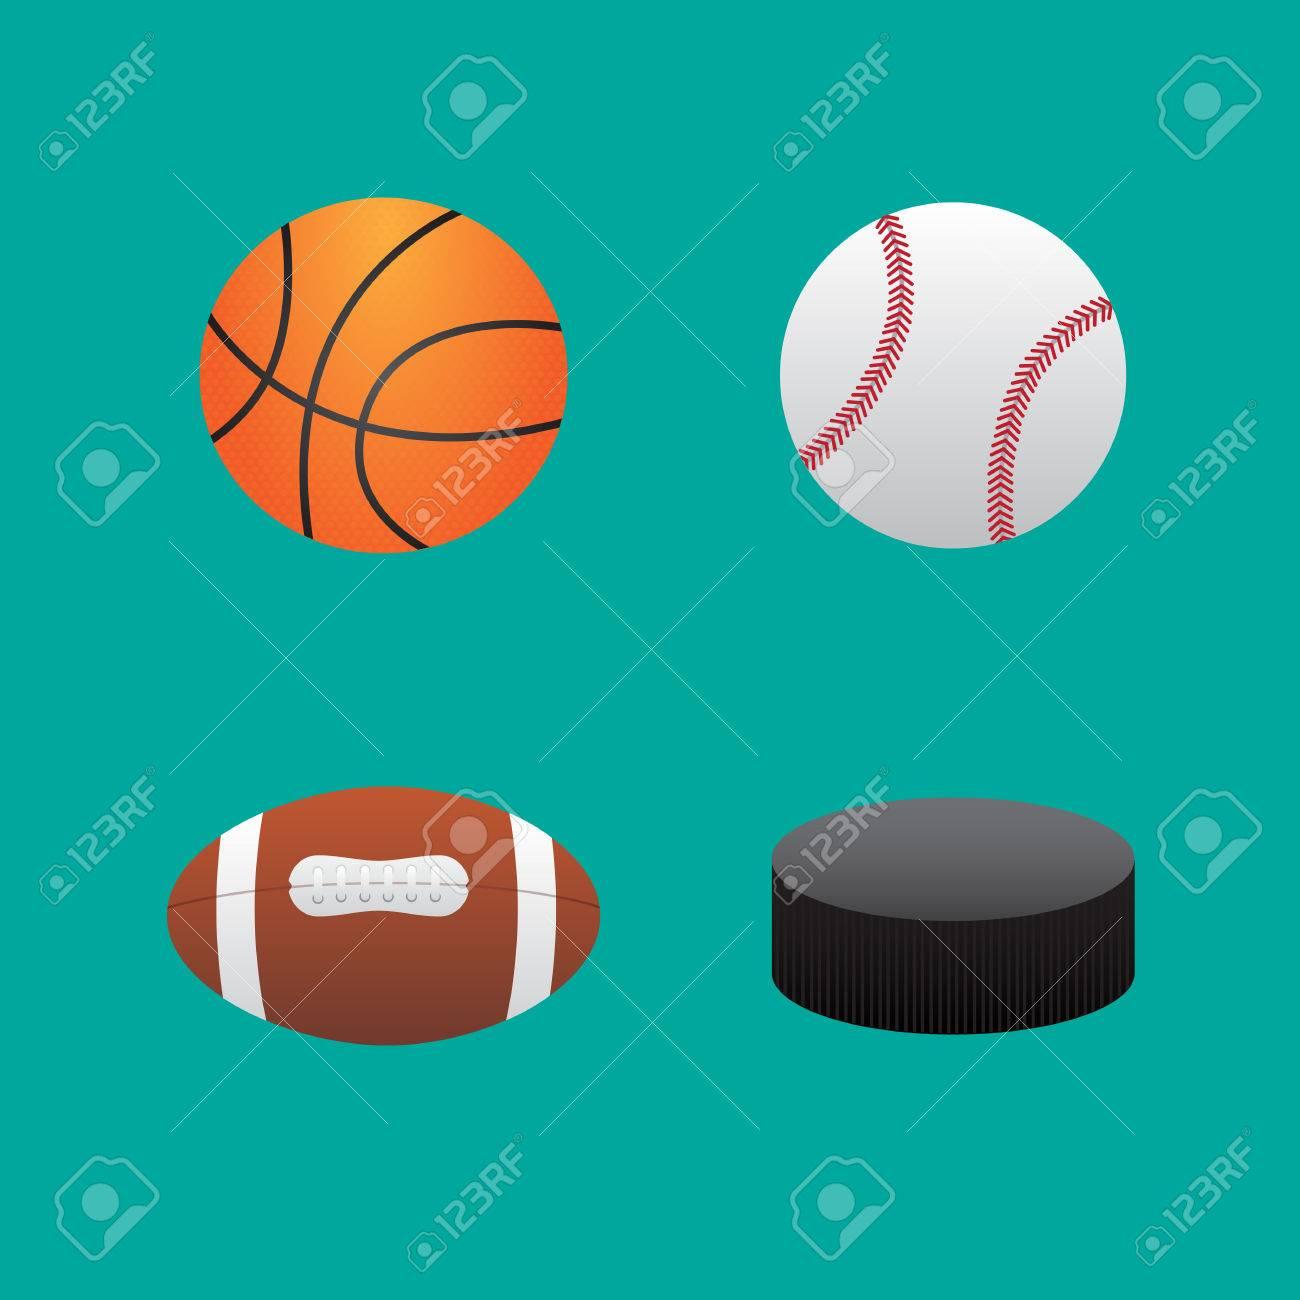 Icons balls baseball football basketball and hockey puck.